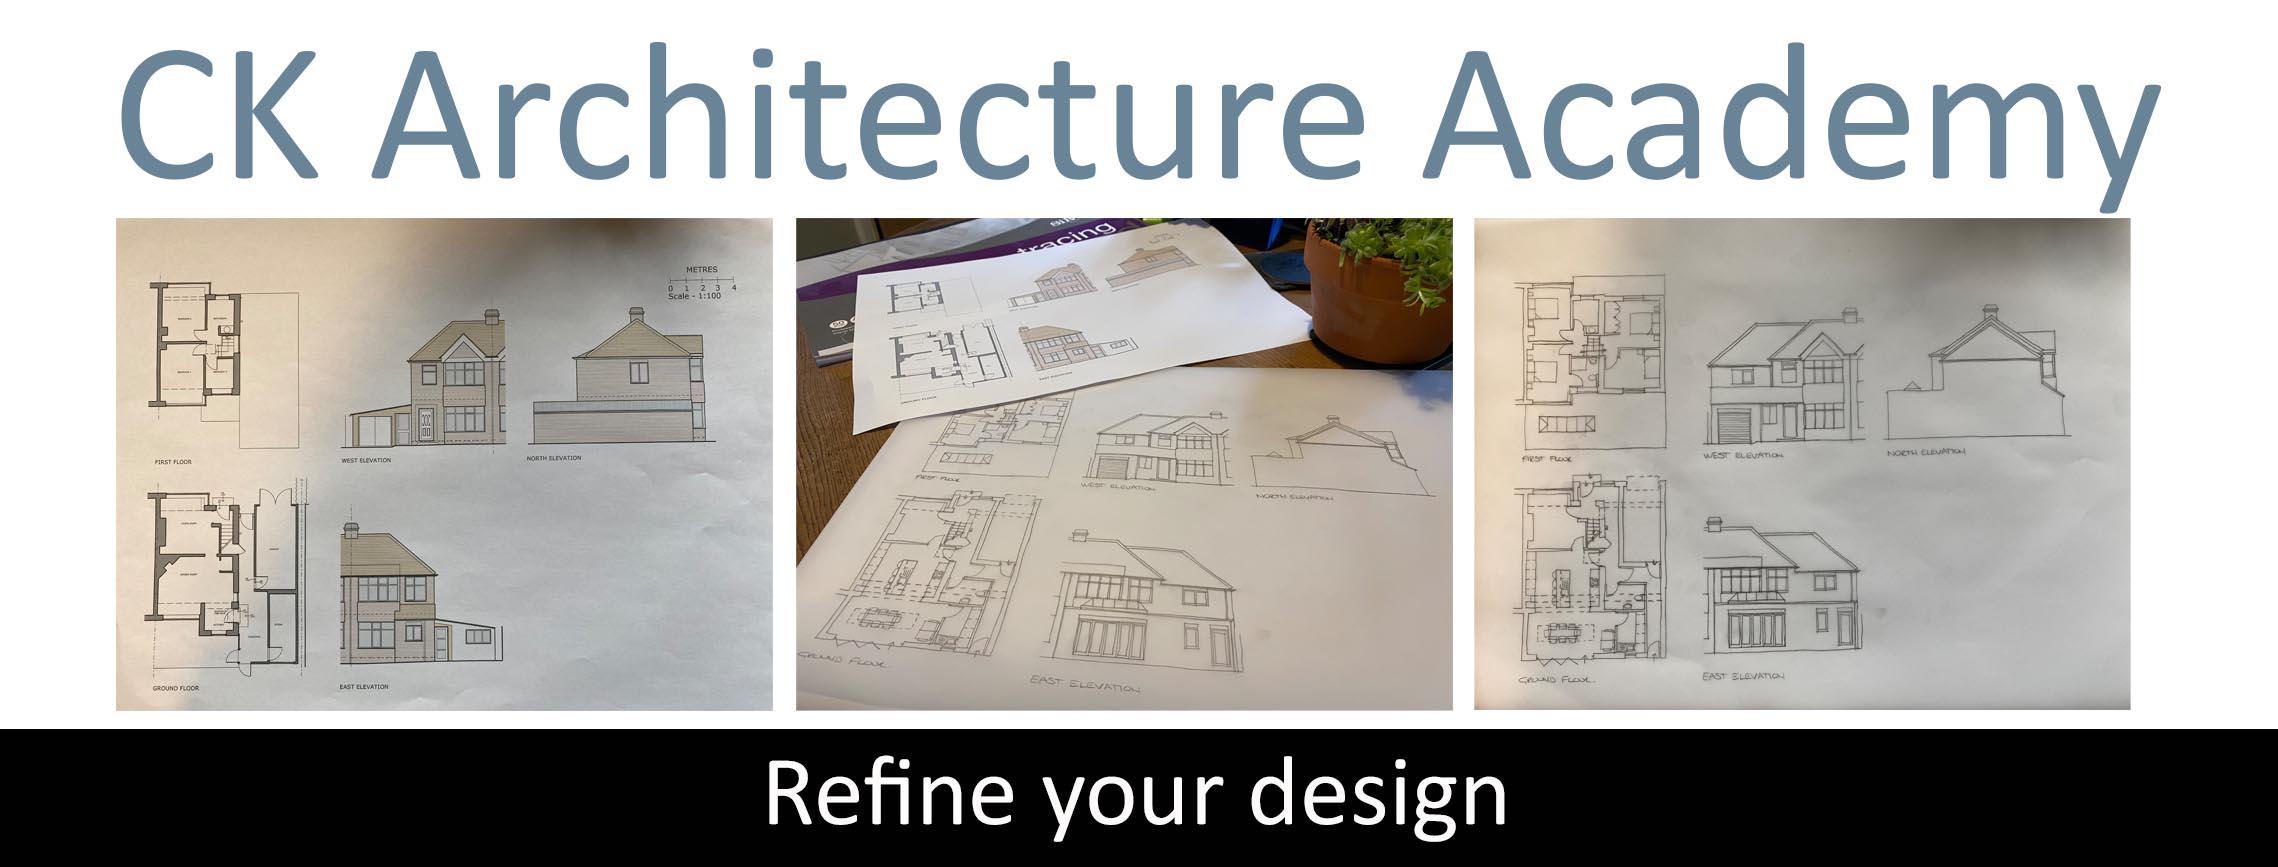 CKAA REFINE YOUR DESIGN banner